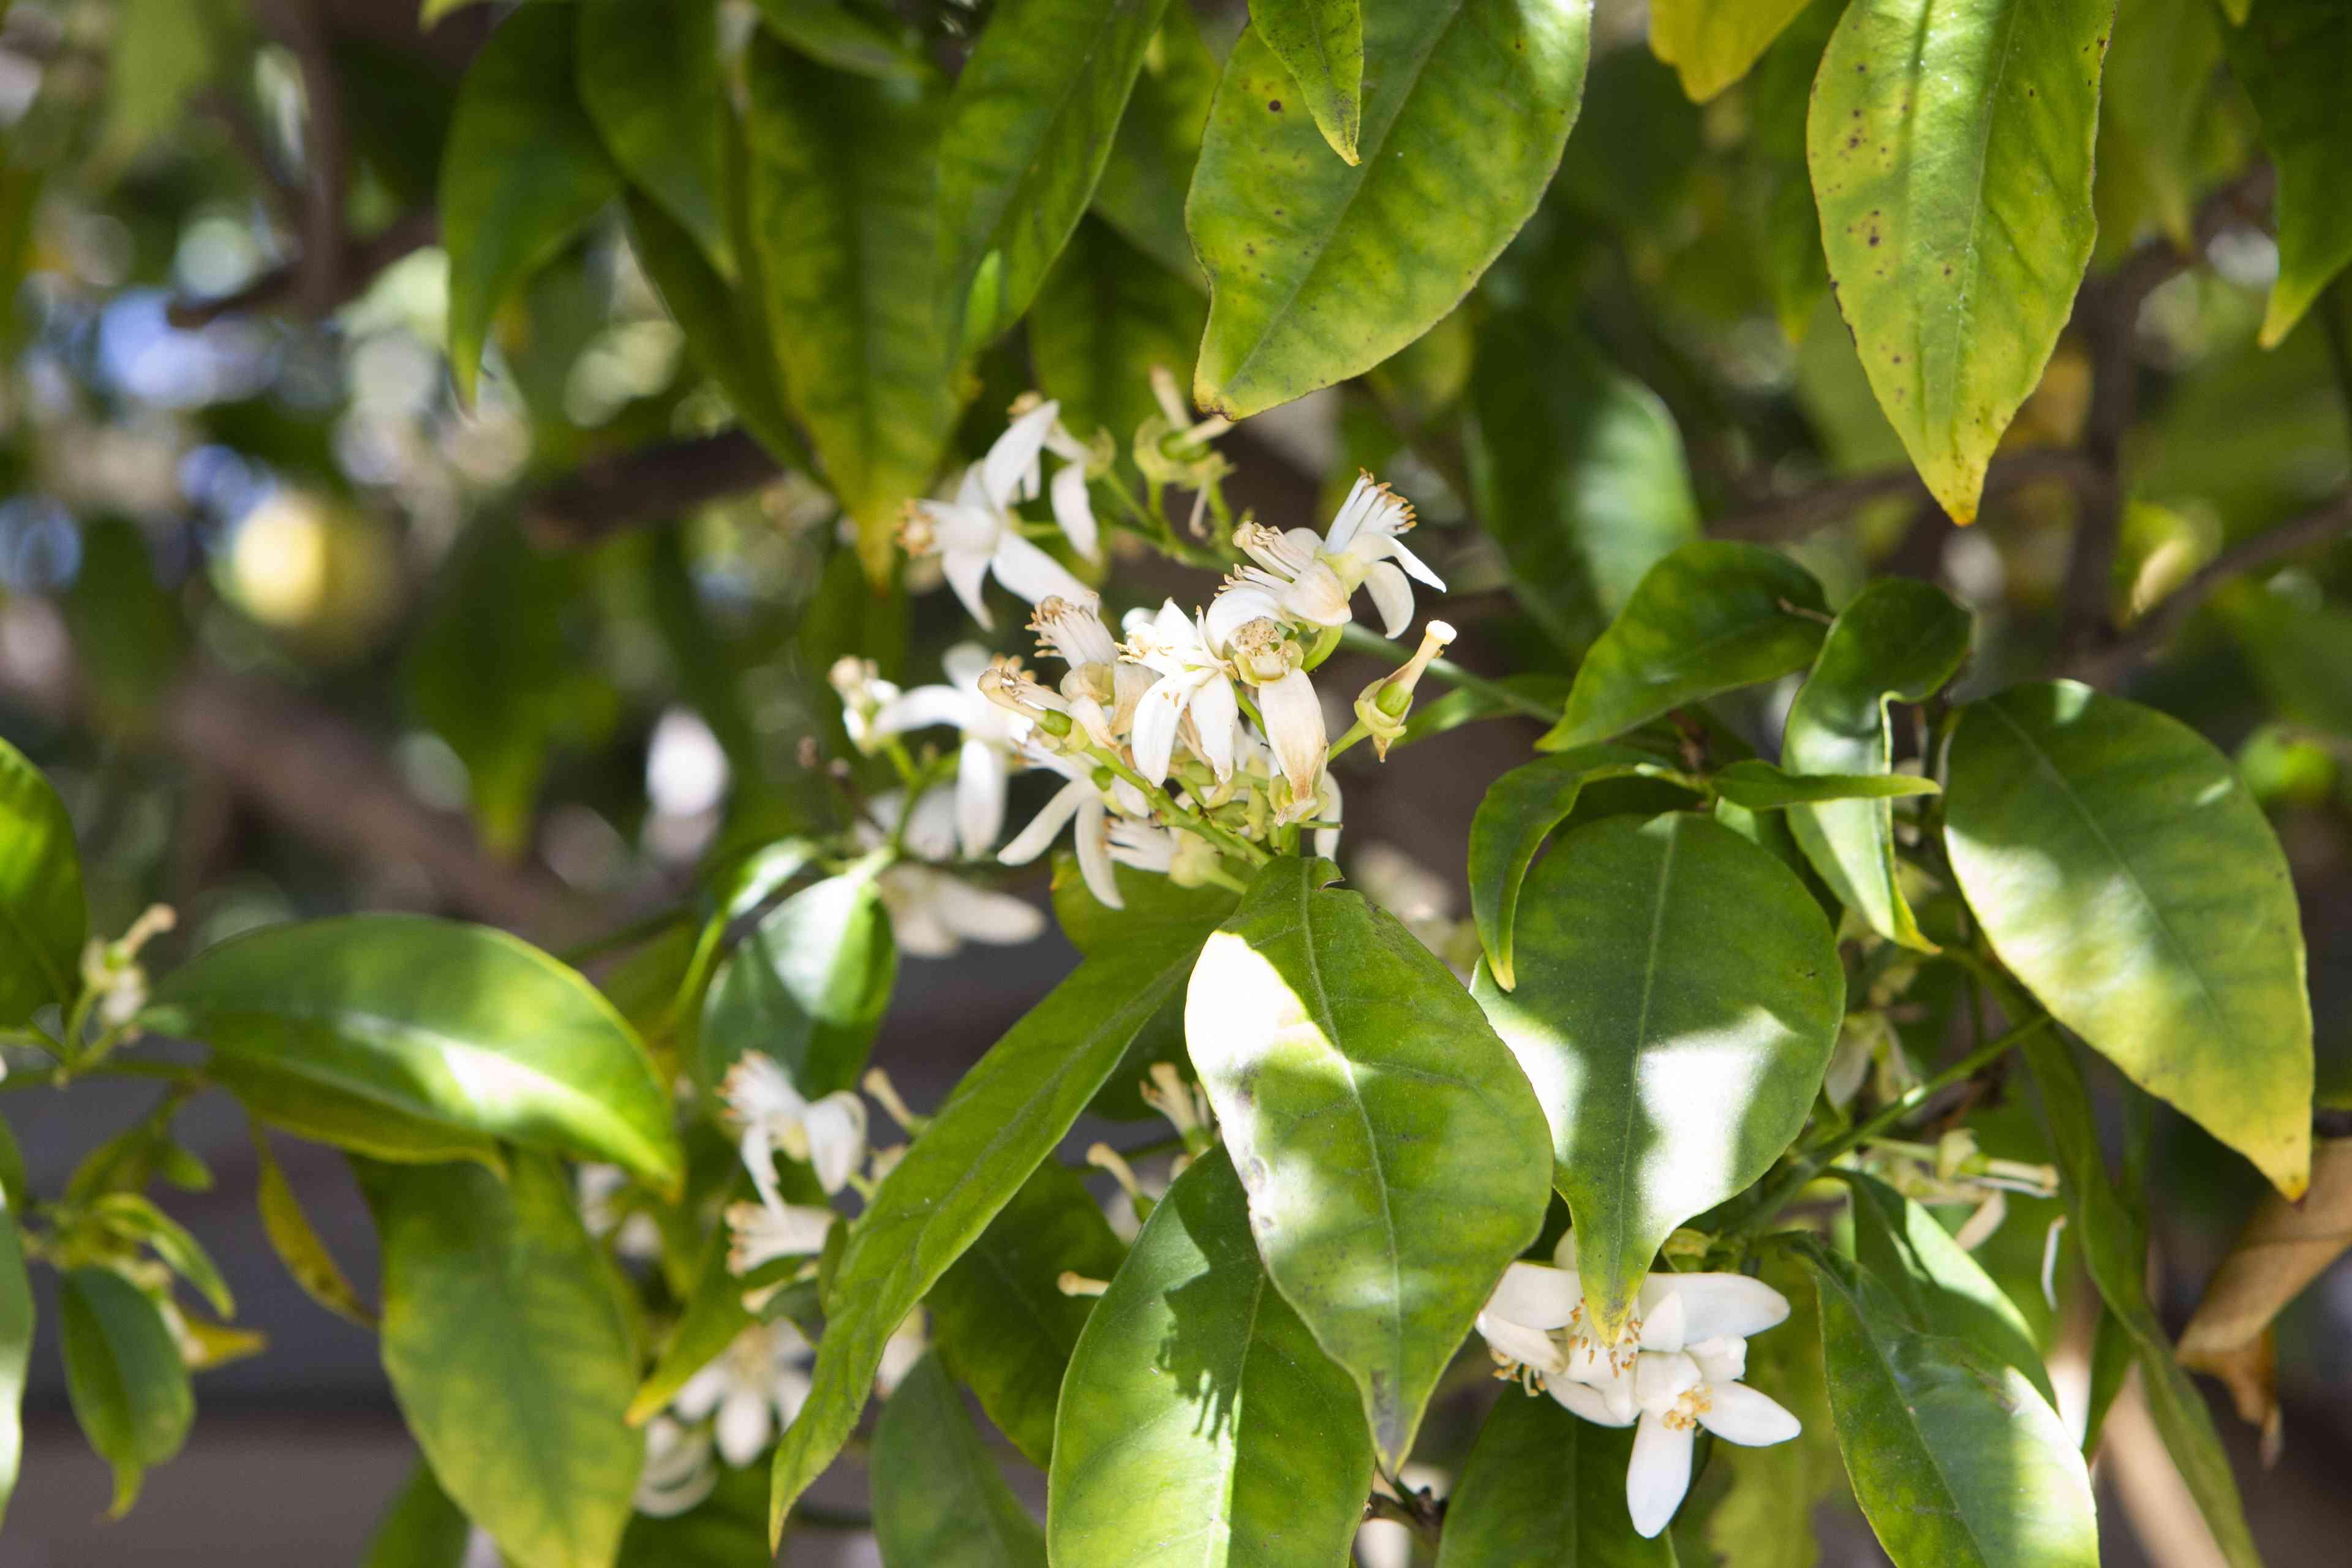 Lisbon lemon tree leaves and small white flowers closeup